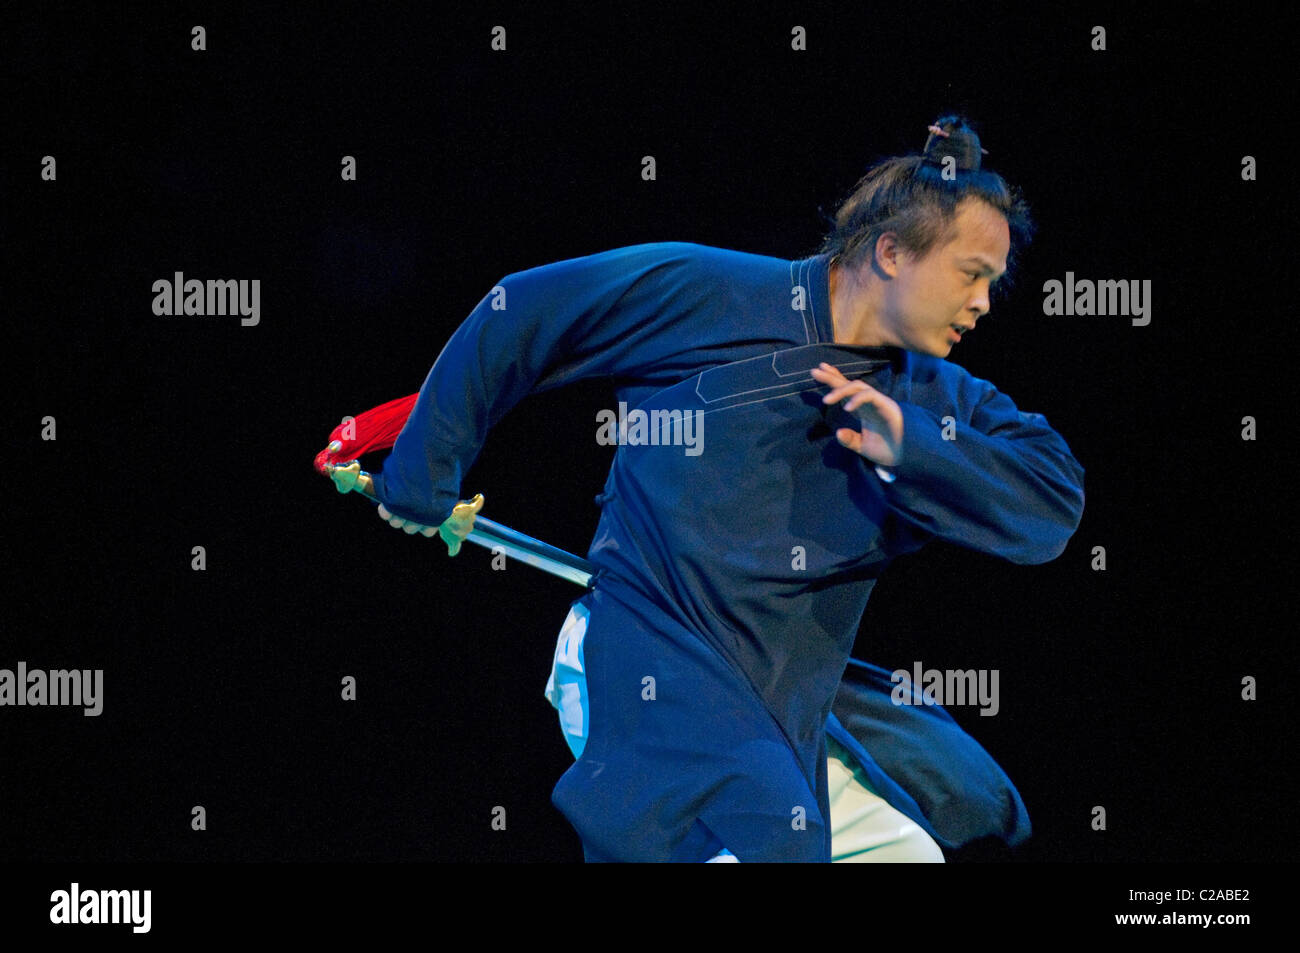 Kung Fu Wudang Exhibition at Festival des Arts Martiaux de Bercy, Paris. - Stock Image